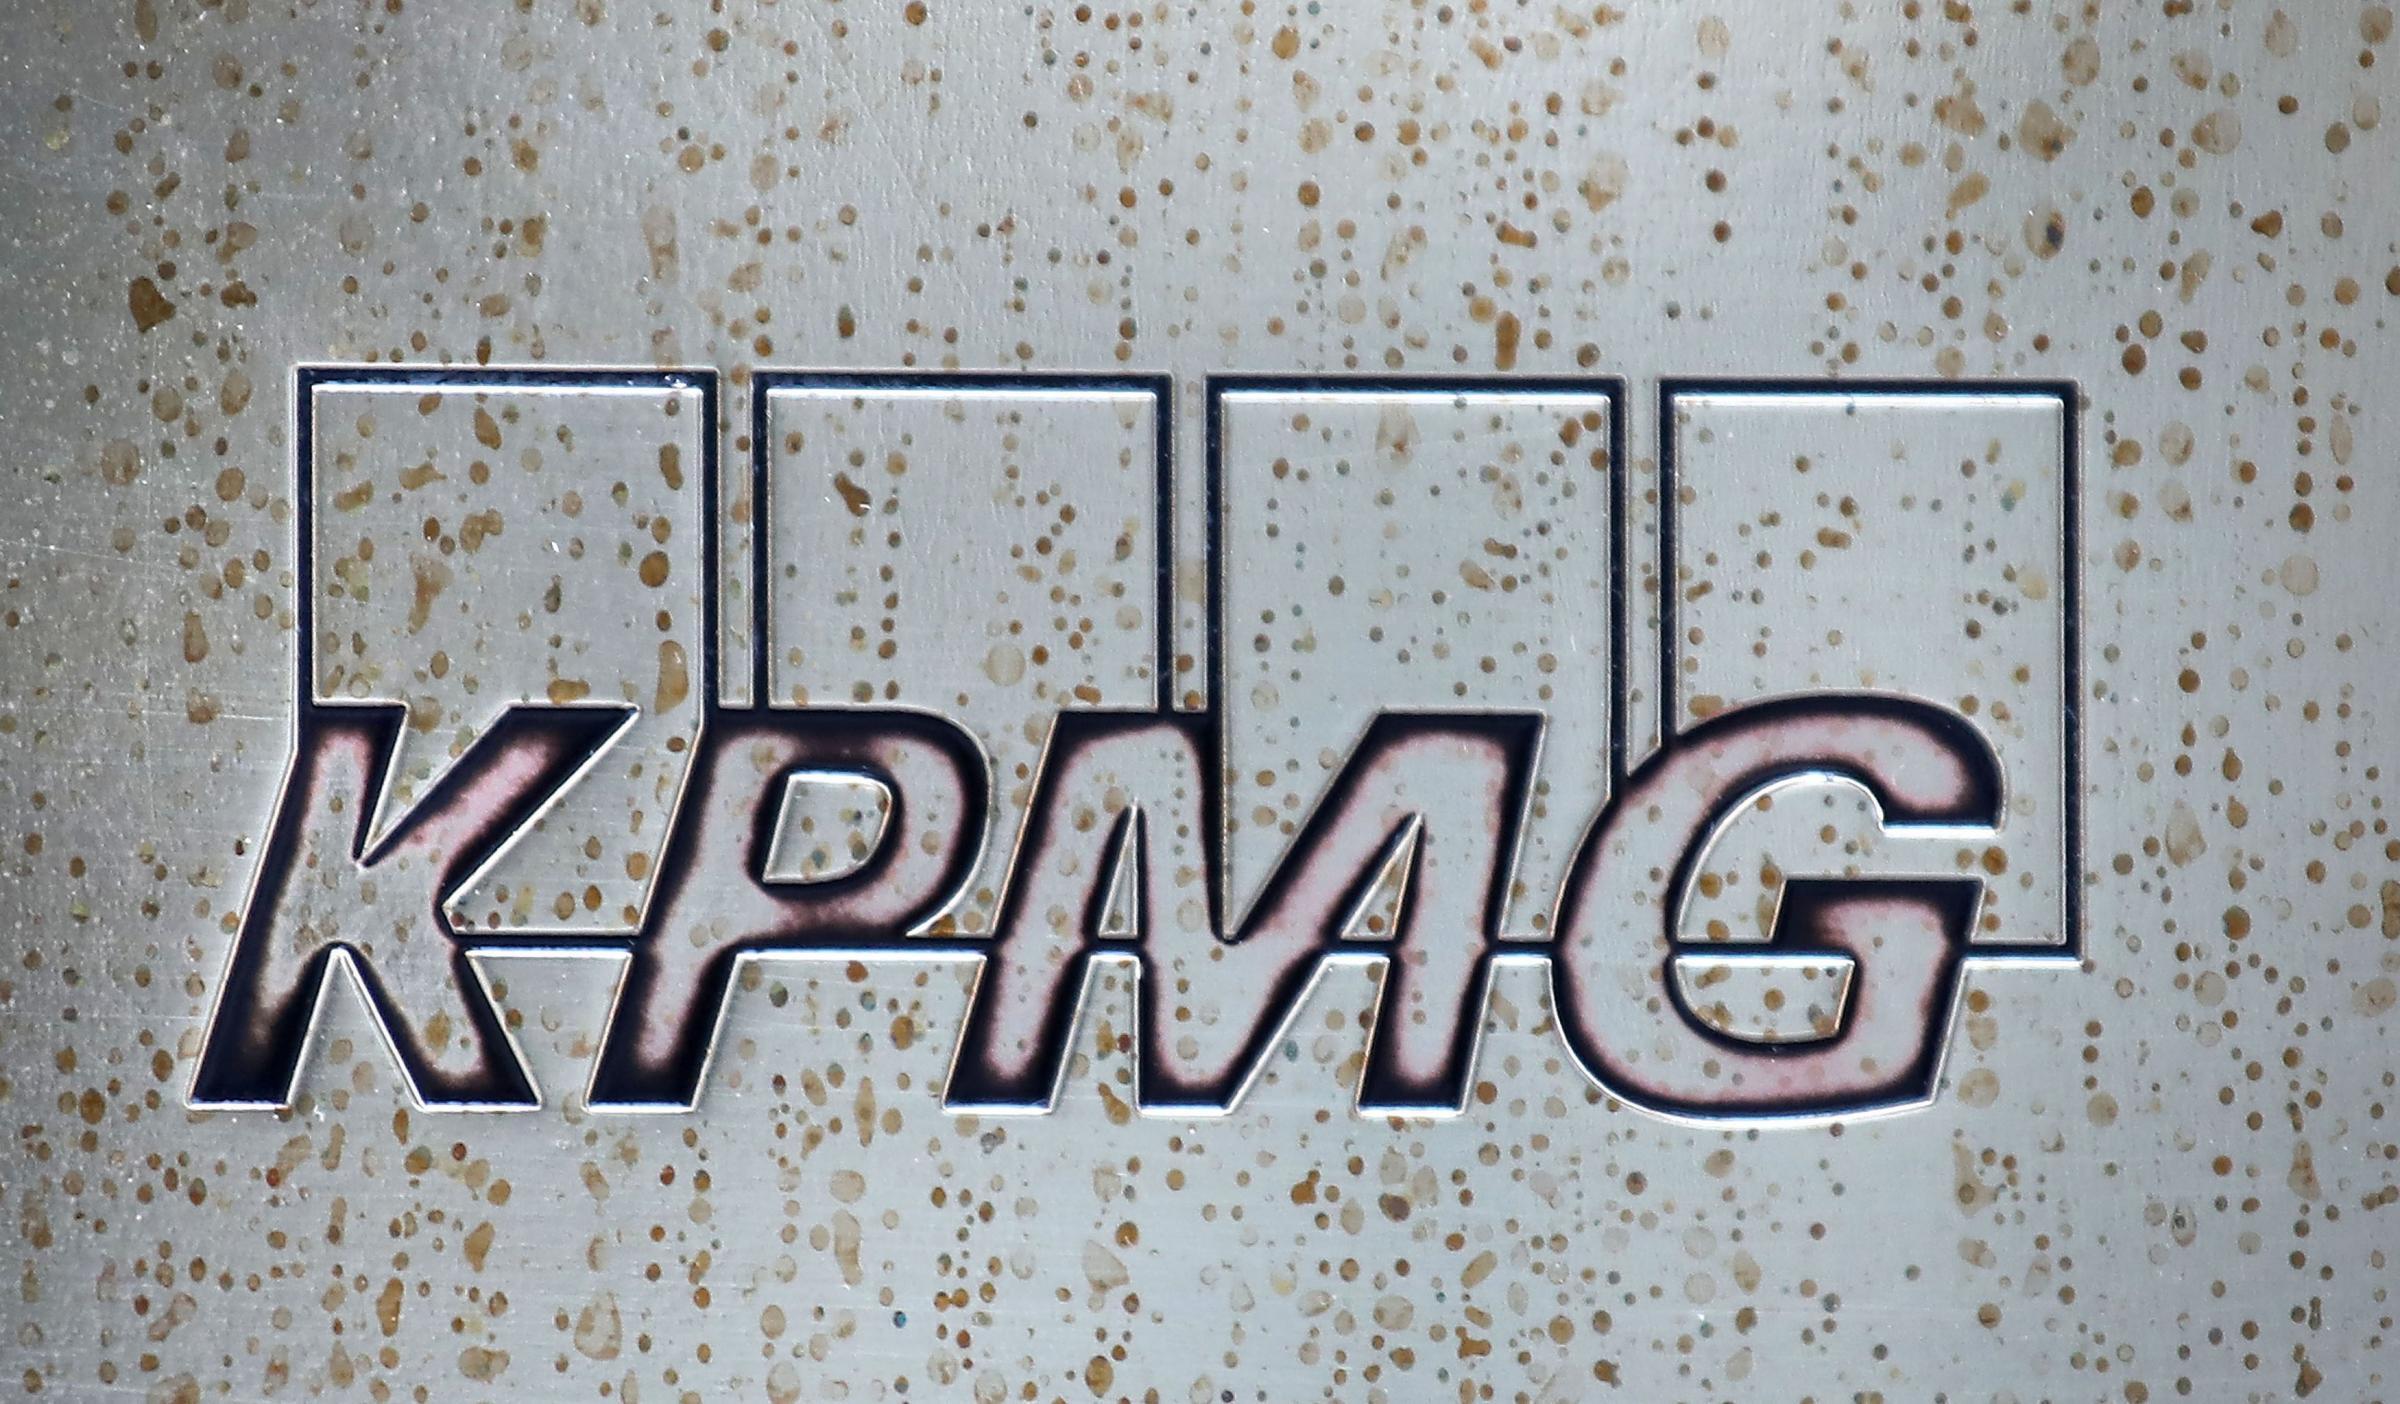 KPMG to create 400 jobs in Glasgow